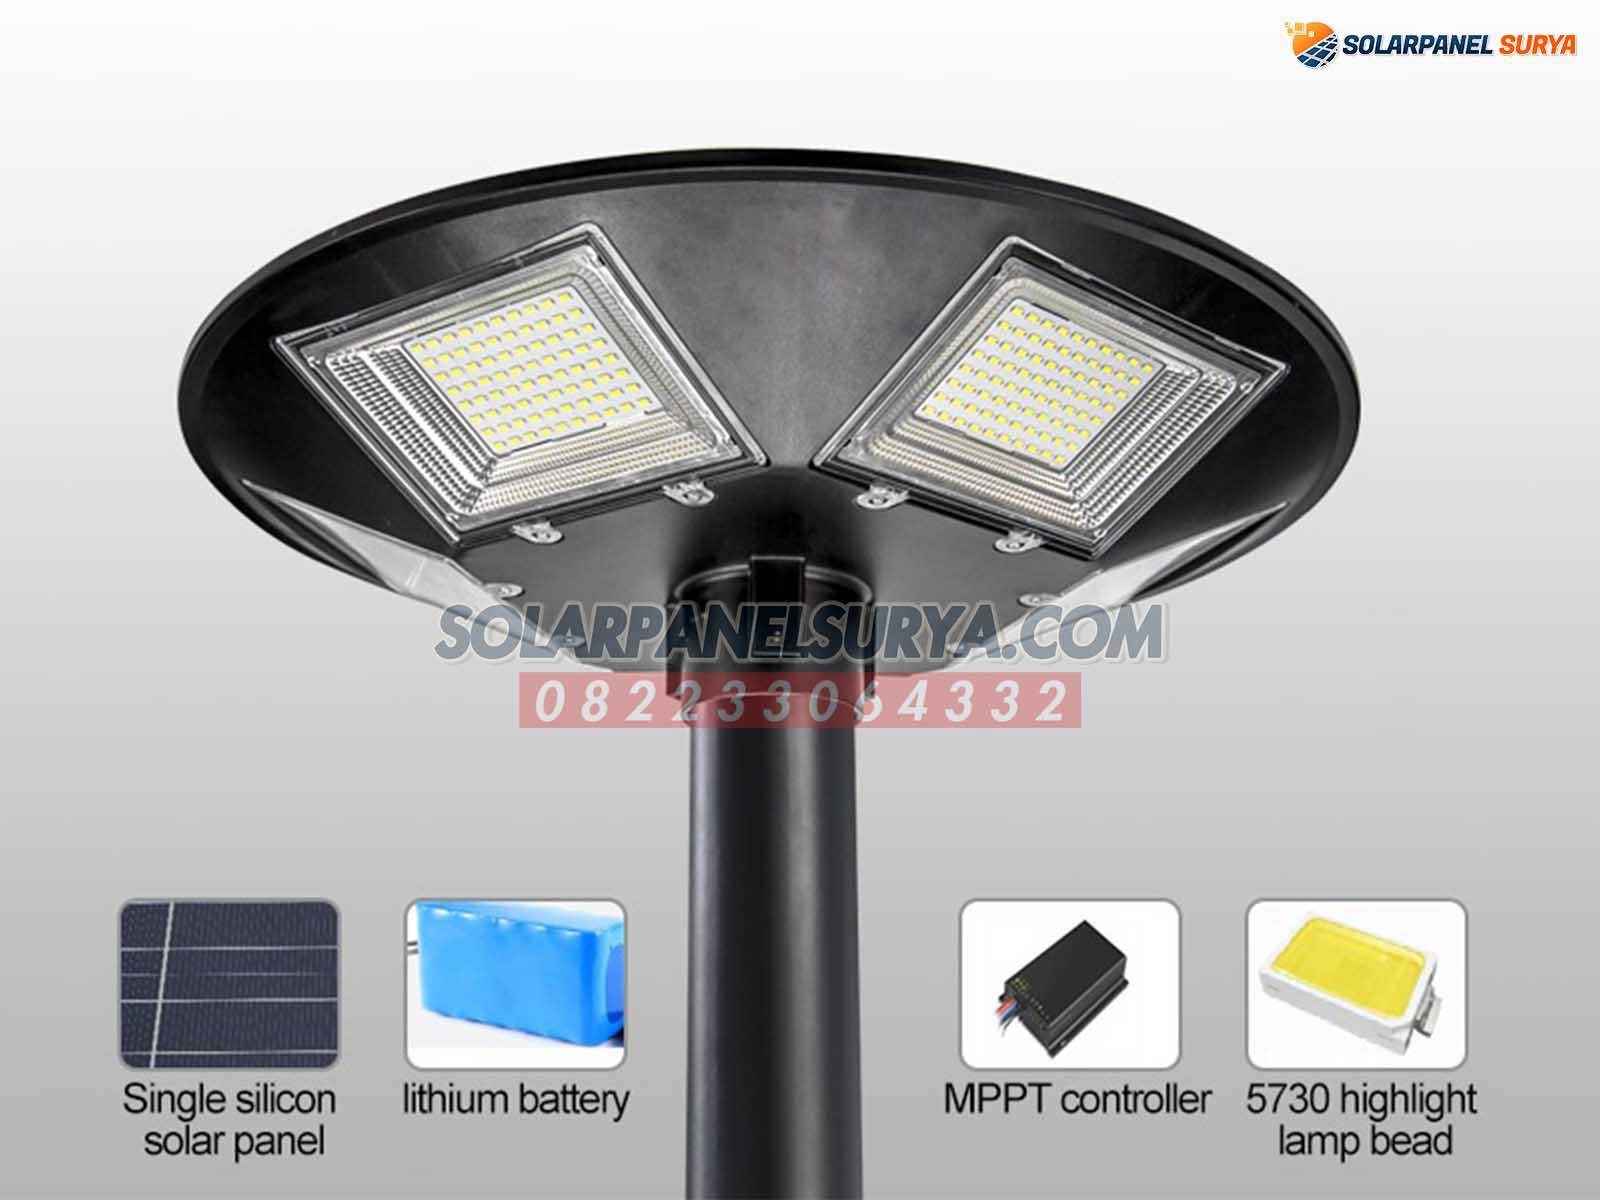 jual Lampu Taman Tenaga Surya 250 Watt murah bergaransi